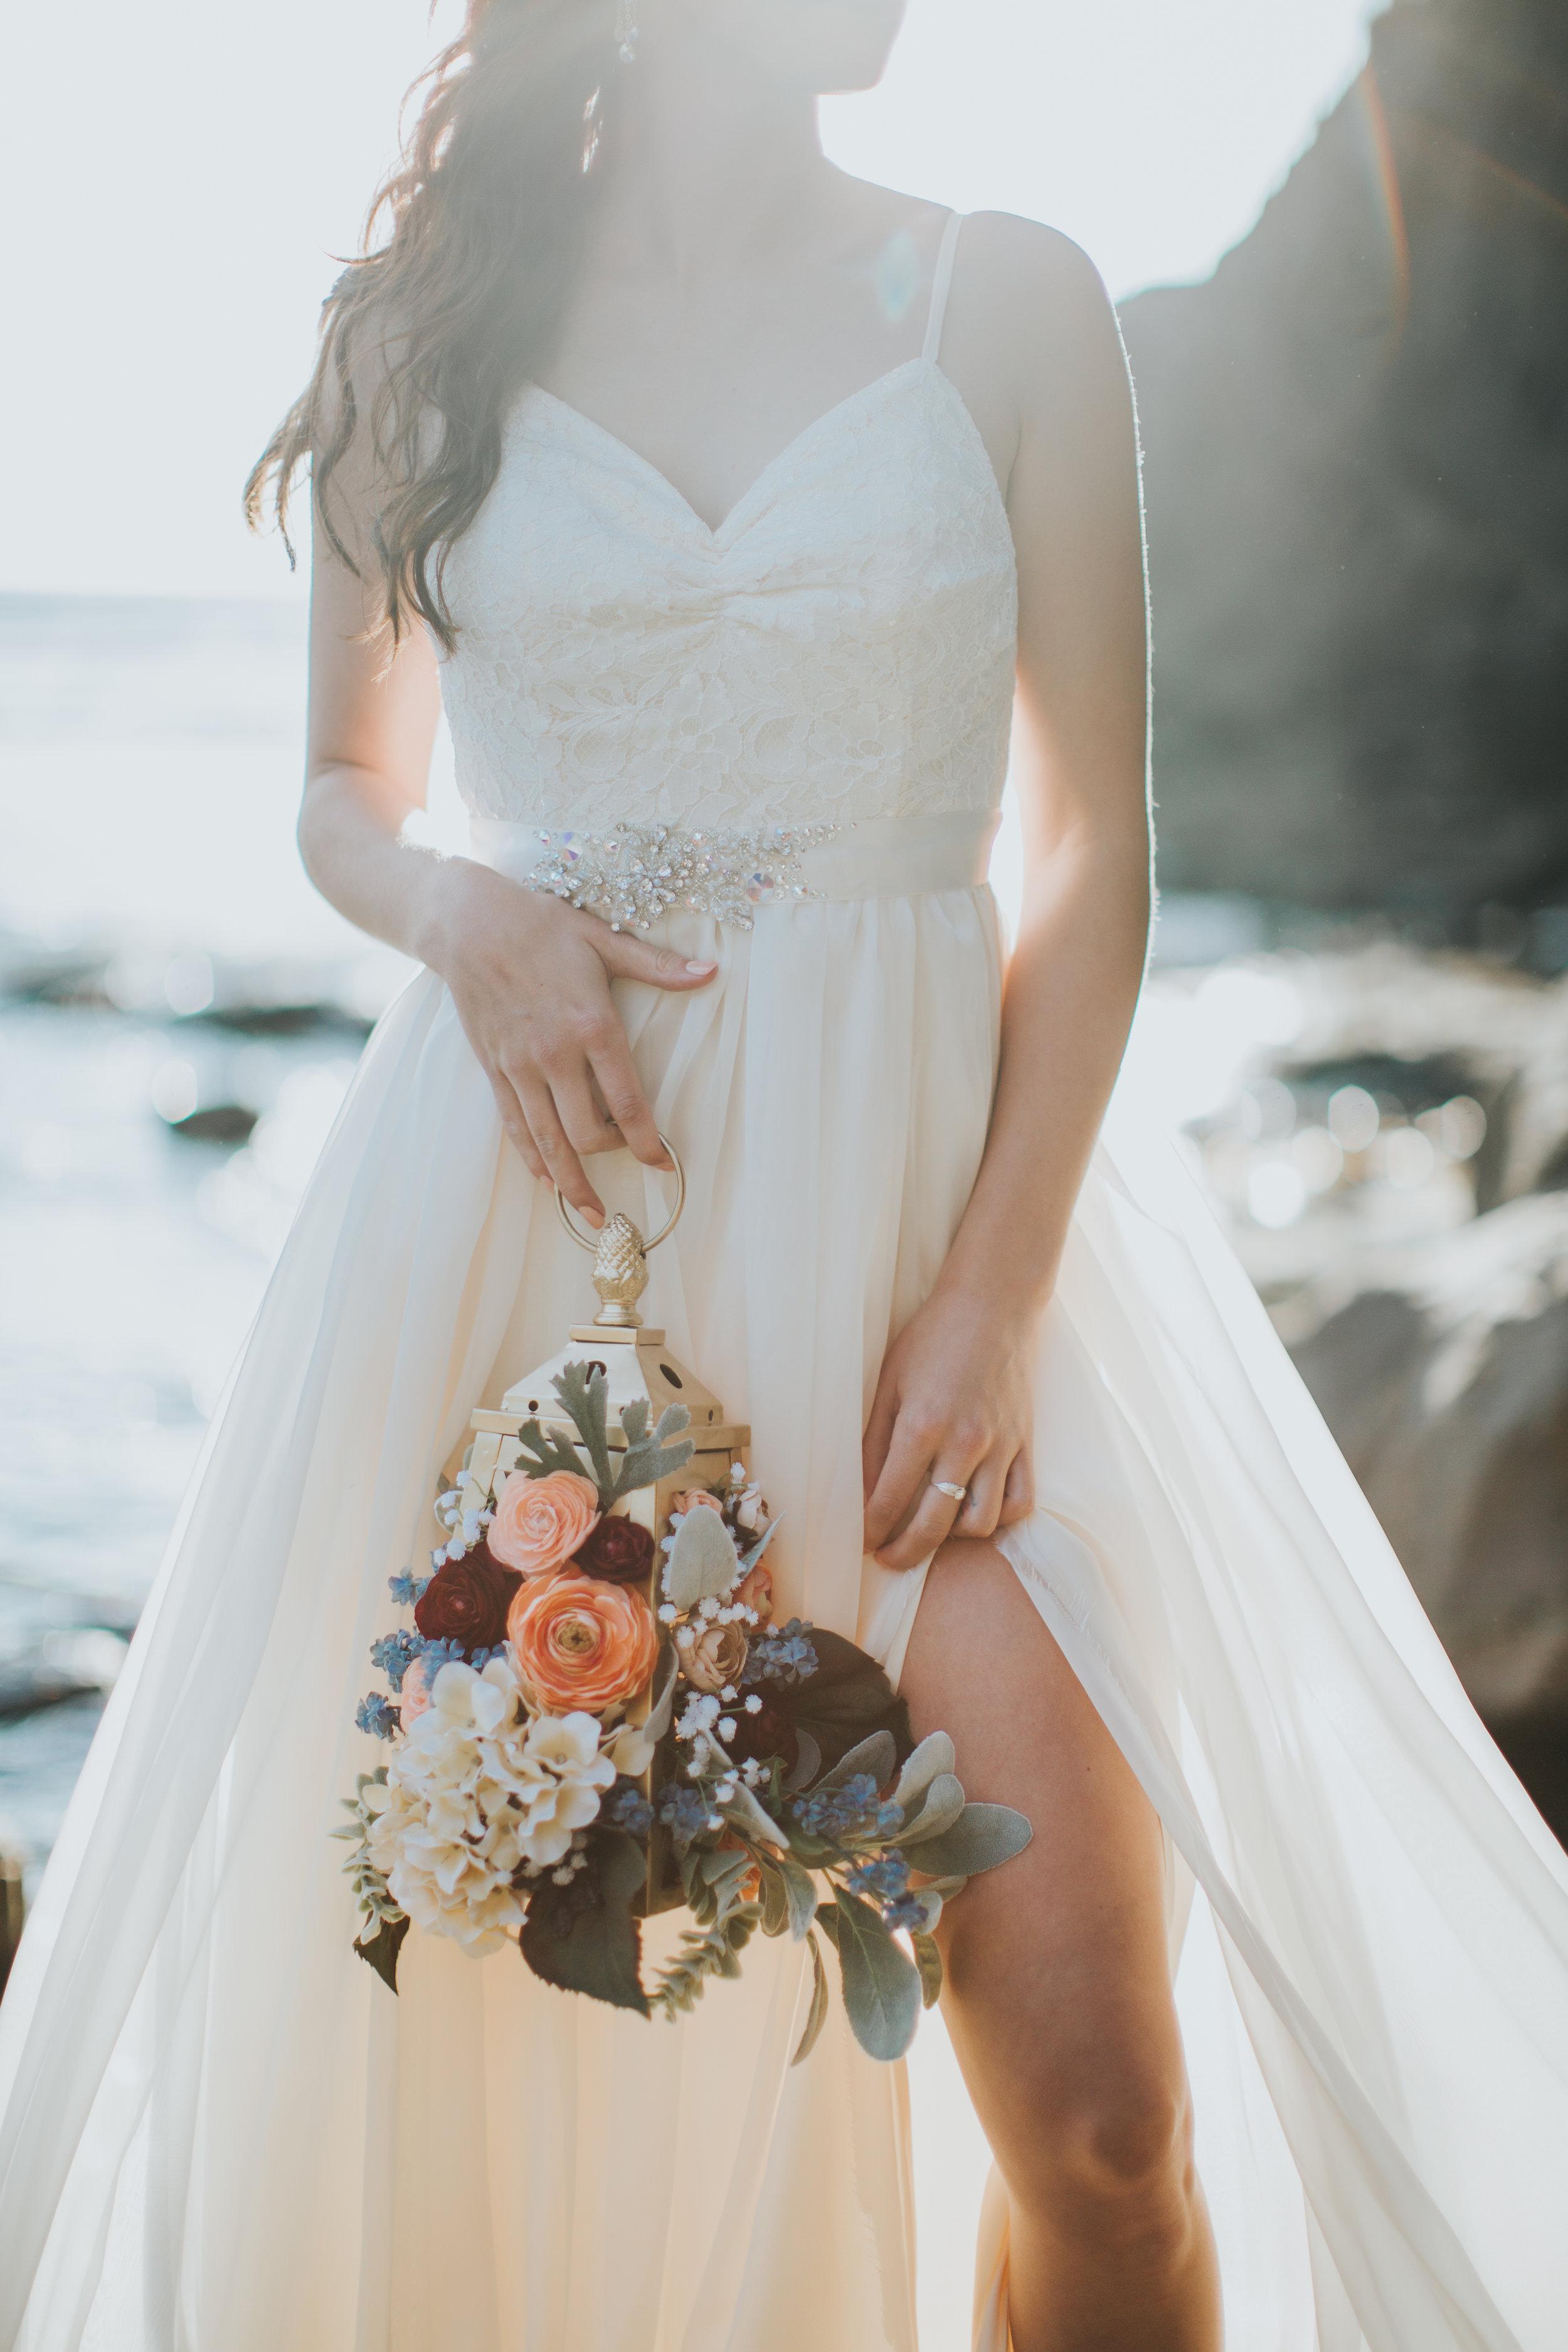 Port-Angeles-Salt-Creek-beach-wedding-bride-PNW-olympic-peninsula-photographer-Kayla-Dawn-Photography-outdoors-golden-hour-dancer-dress (22).jpg